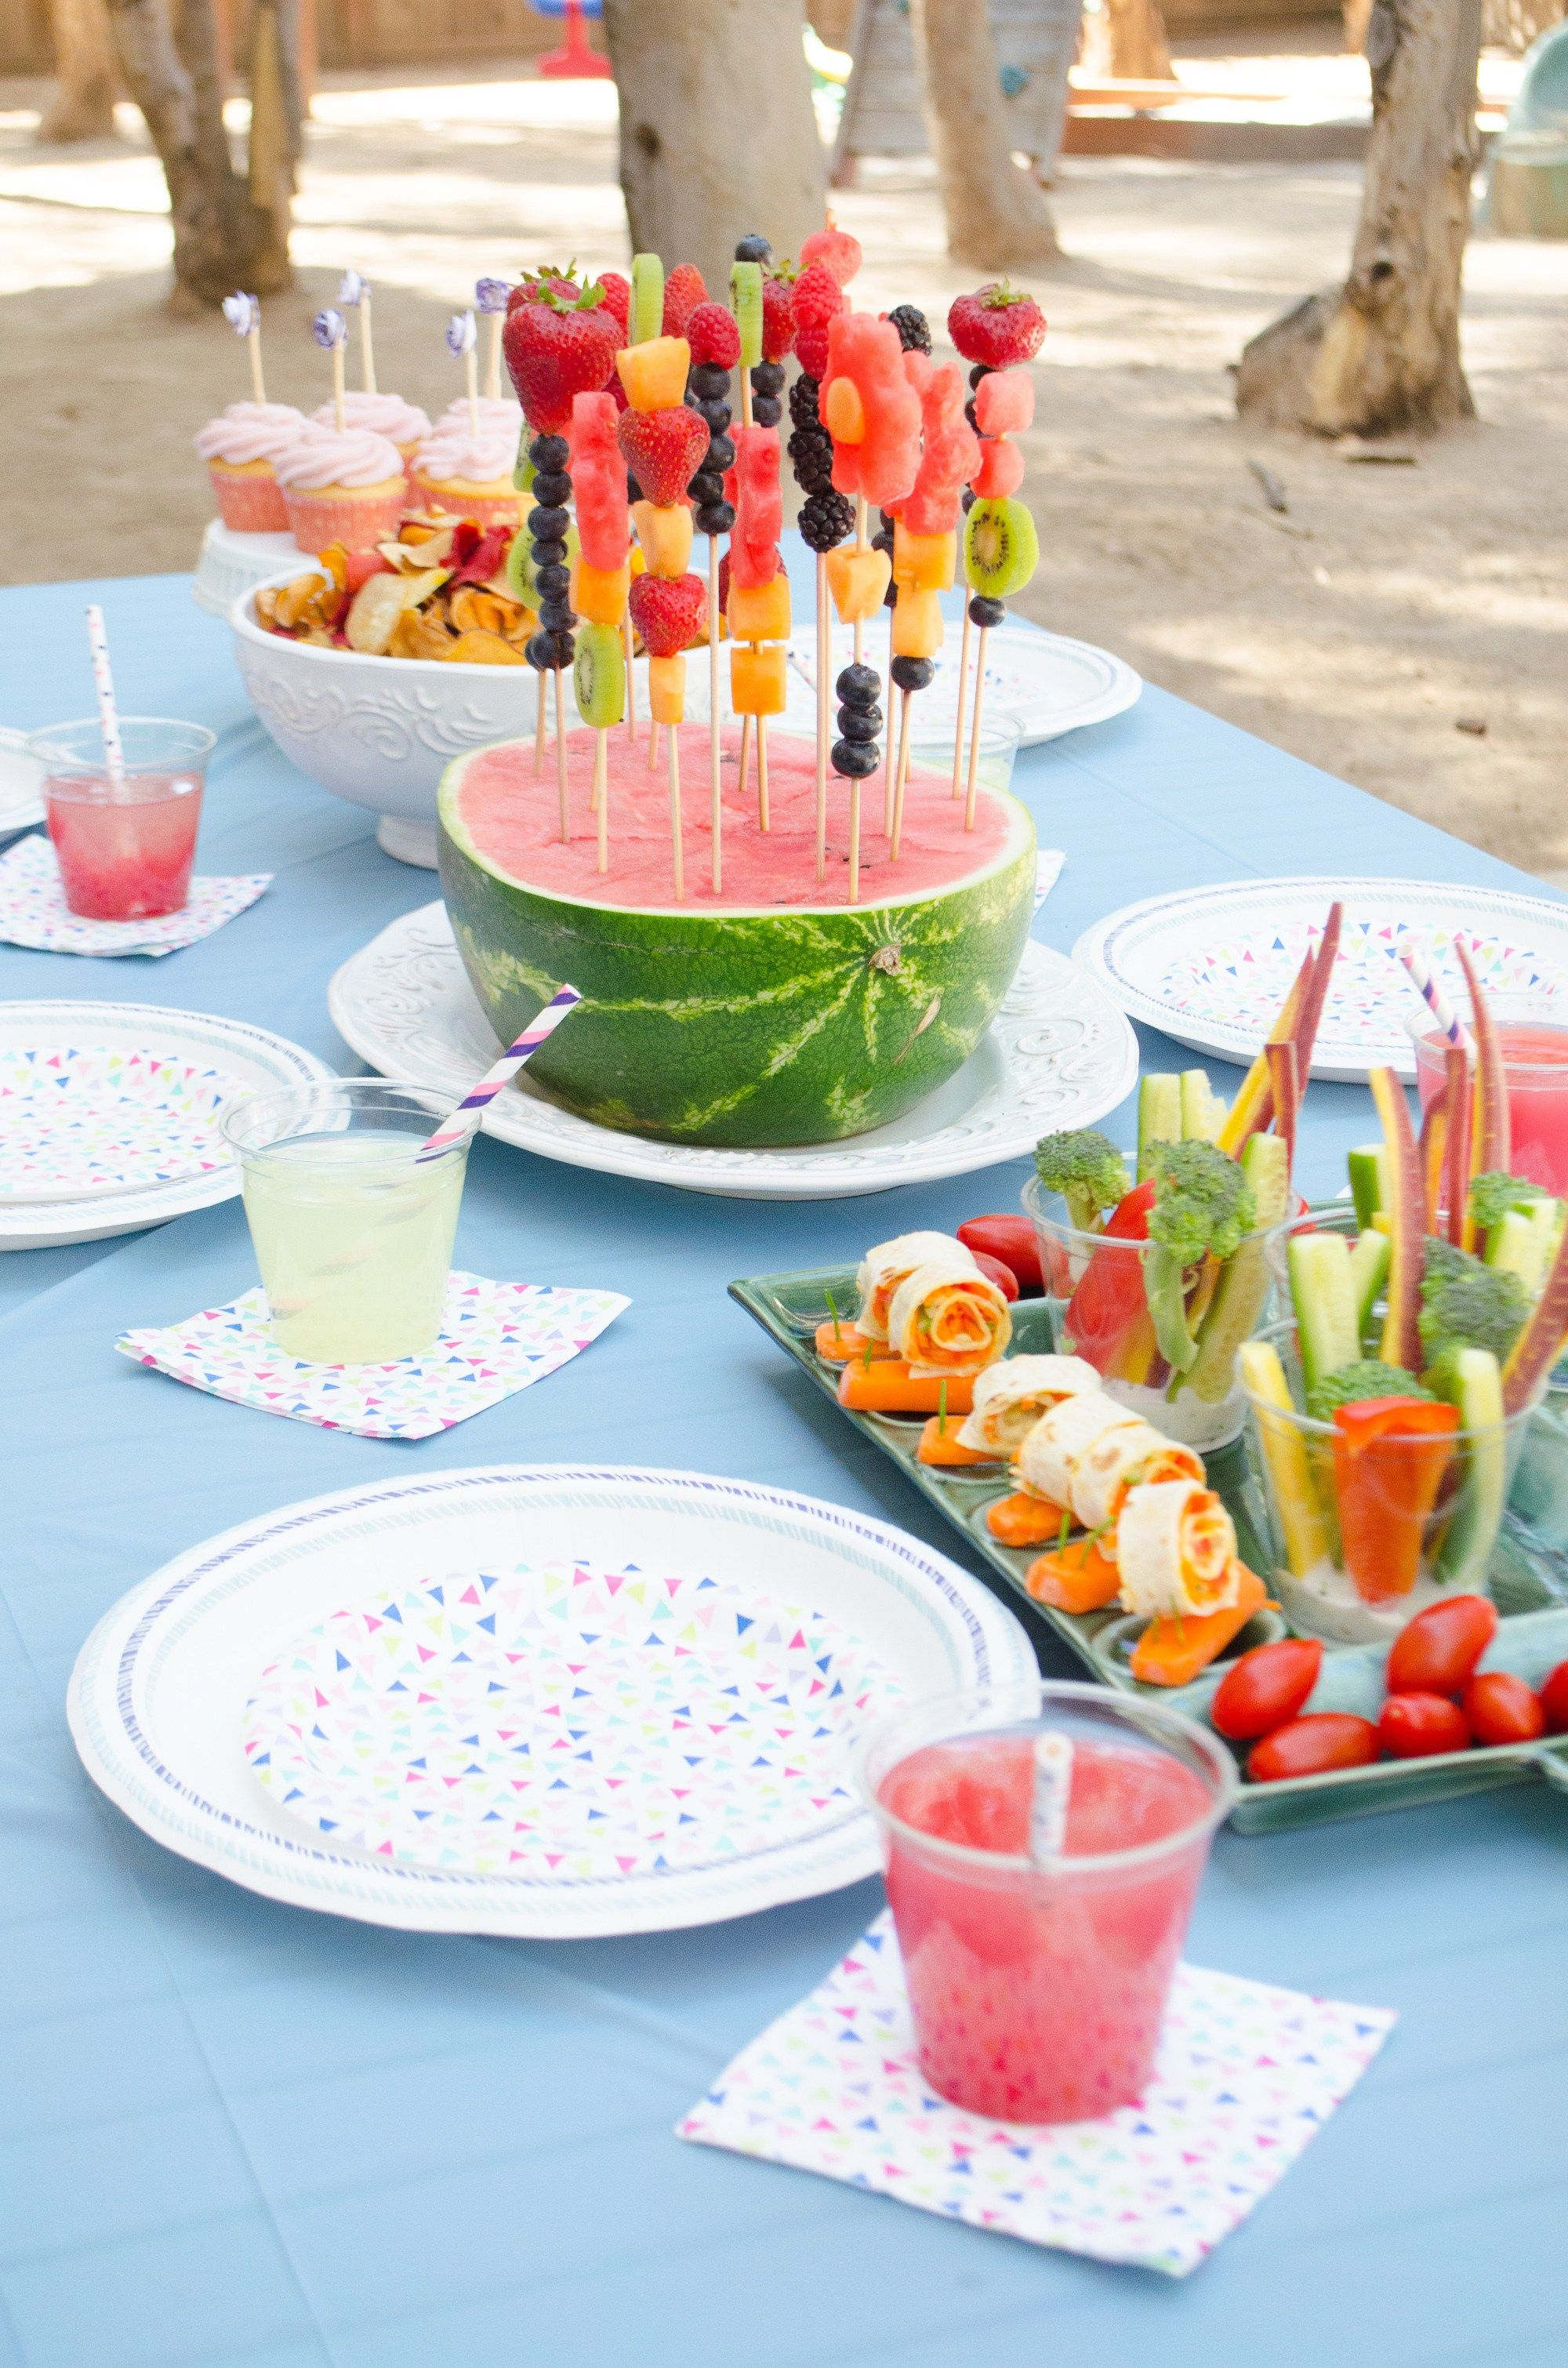 Superb Summer Garden Party Menu Ideas Part - 12: Garden Party Menu From ChefSarahElizabeth.com